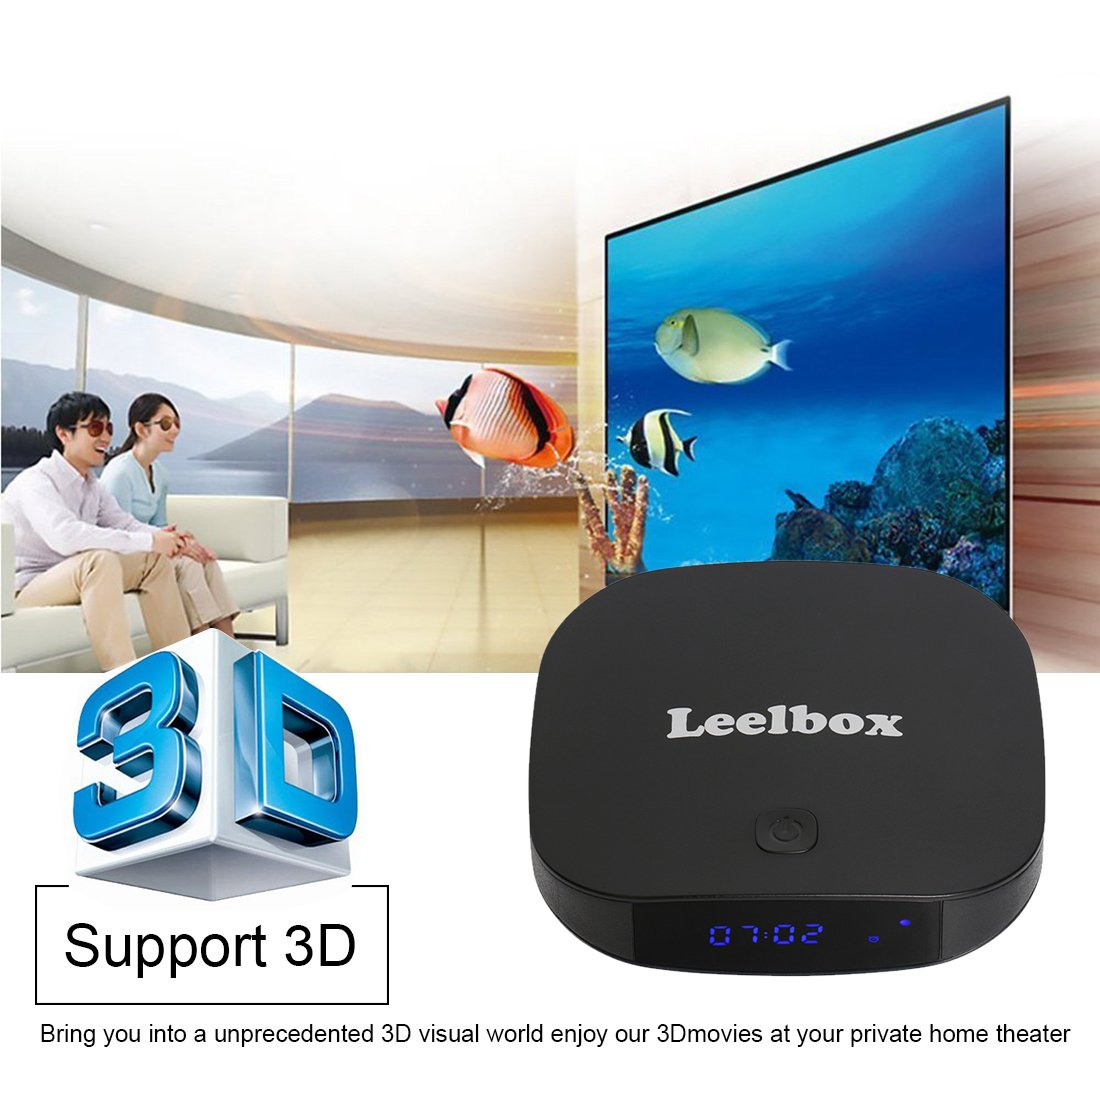 Leelbox Q2 Pro Android 6.0 TV Box Smart TV Box de 2GB RAM+16GB ROM con BT 4.0, Soporta 4K (60HZ)/2.4G y 5.8G Dual-WIFI/HD/H.265: Amazon.es: Electrónica